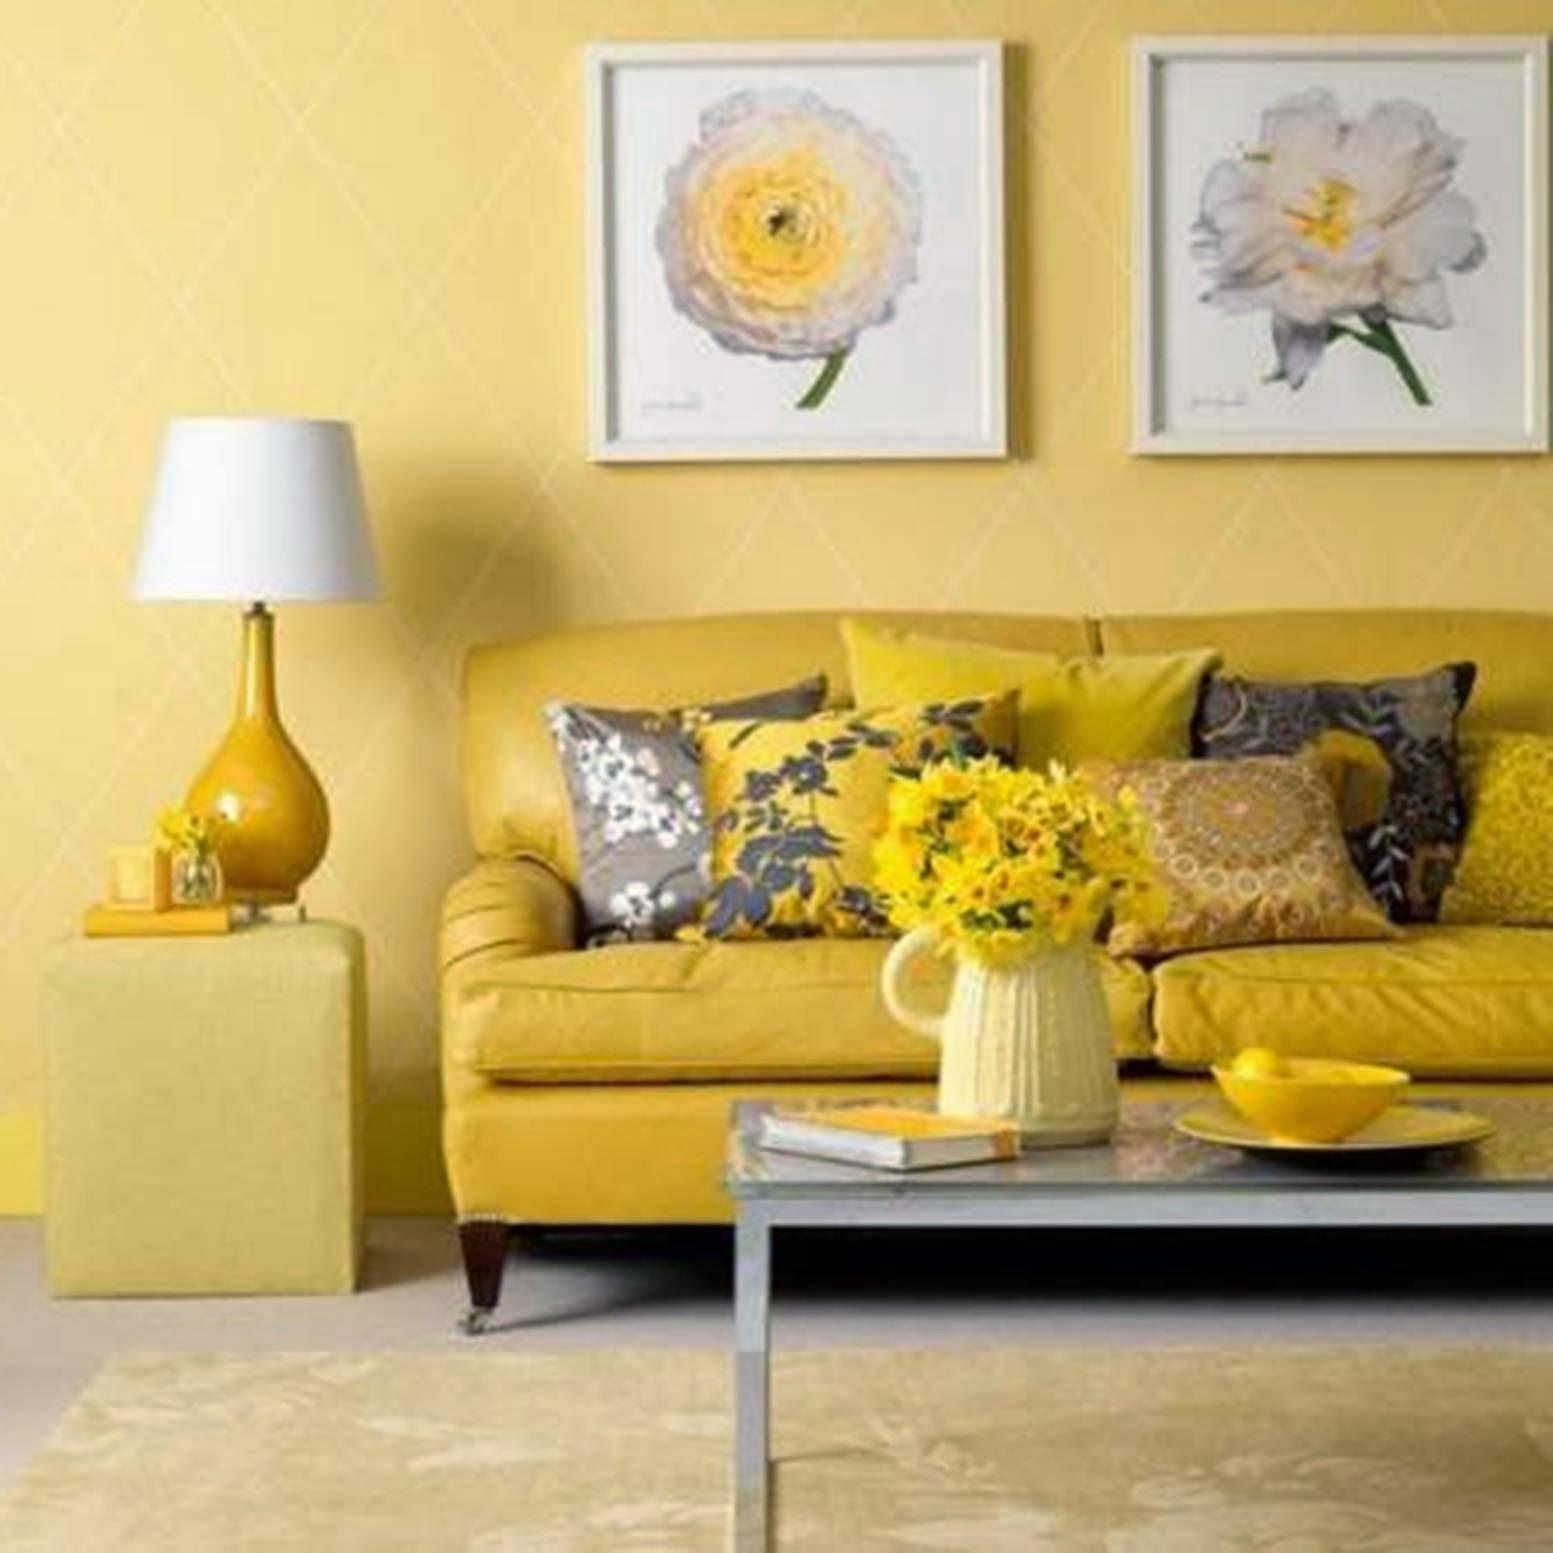 Design Decor & Disha | An Indian Design & Decor Blog: 2013